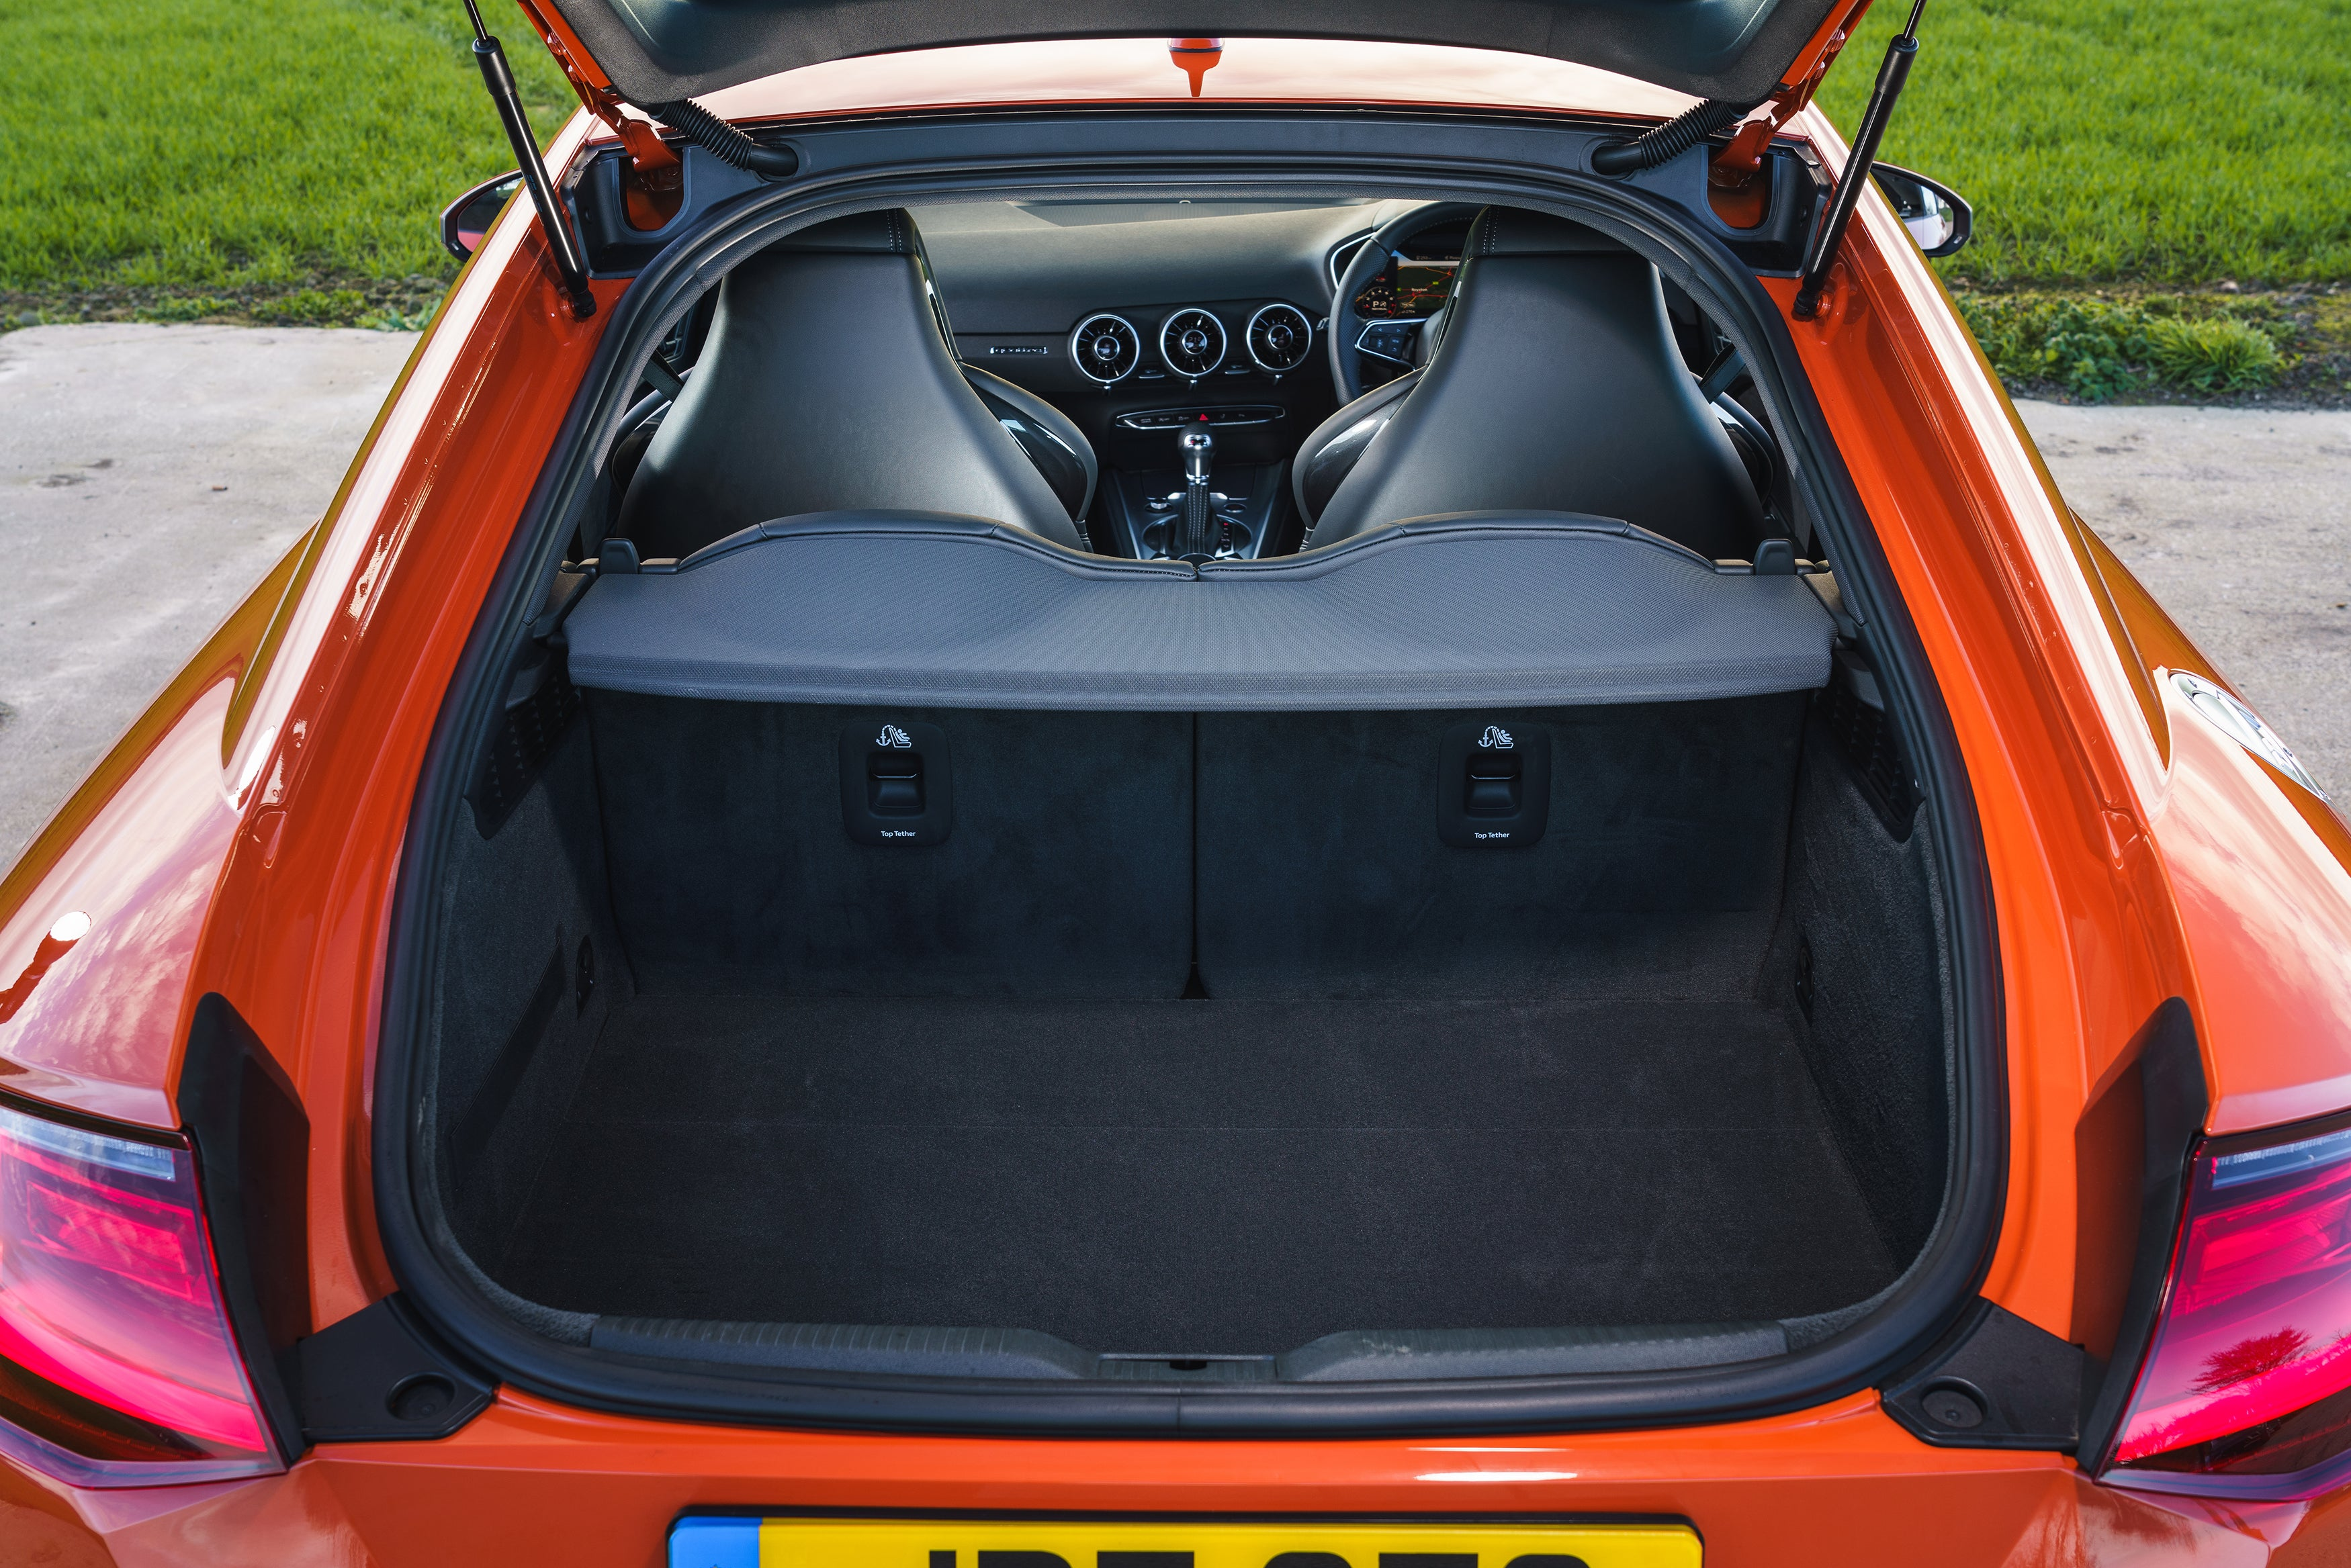 Audi TT Boot